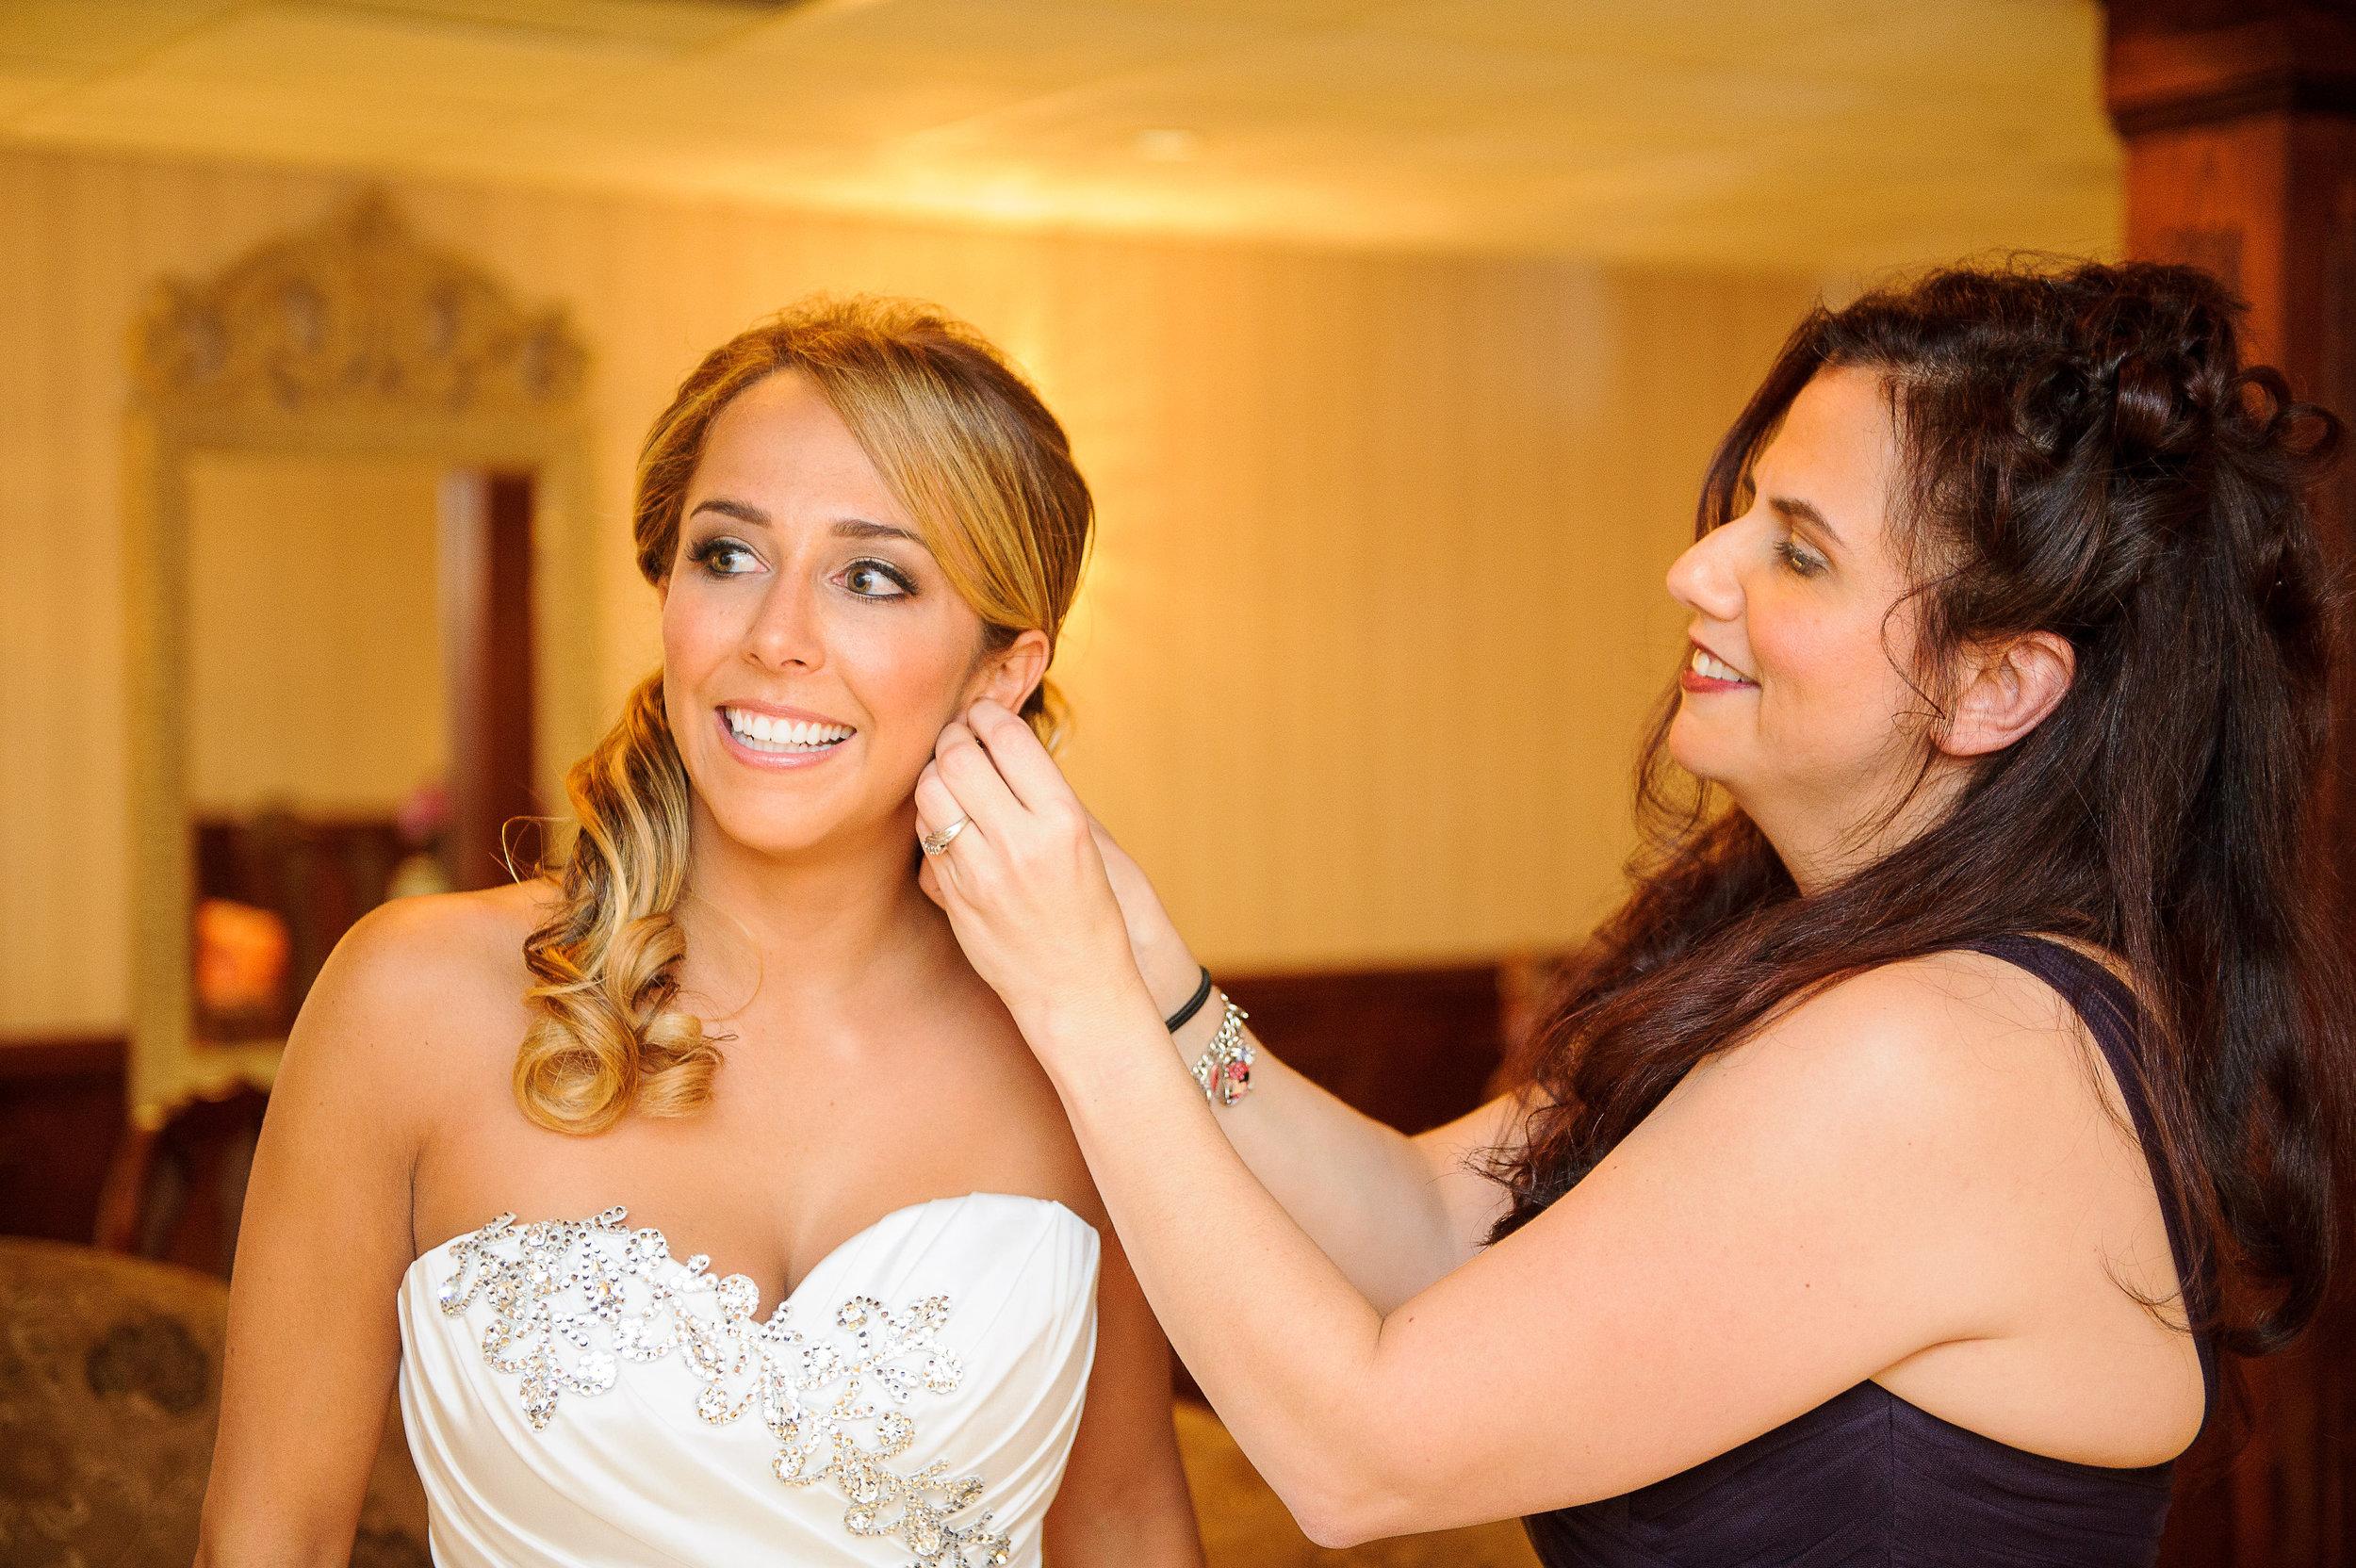 Ceci_New_York_Custom_Invitation_ New_Jersey_Wedding_Luxury_Personalized_Ceci_Style_Bride_Foil_Stamping81.JPG